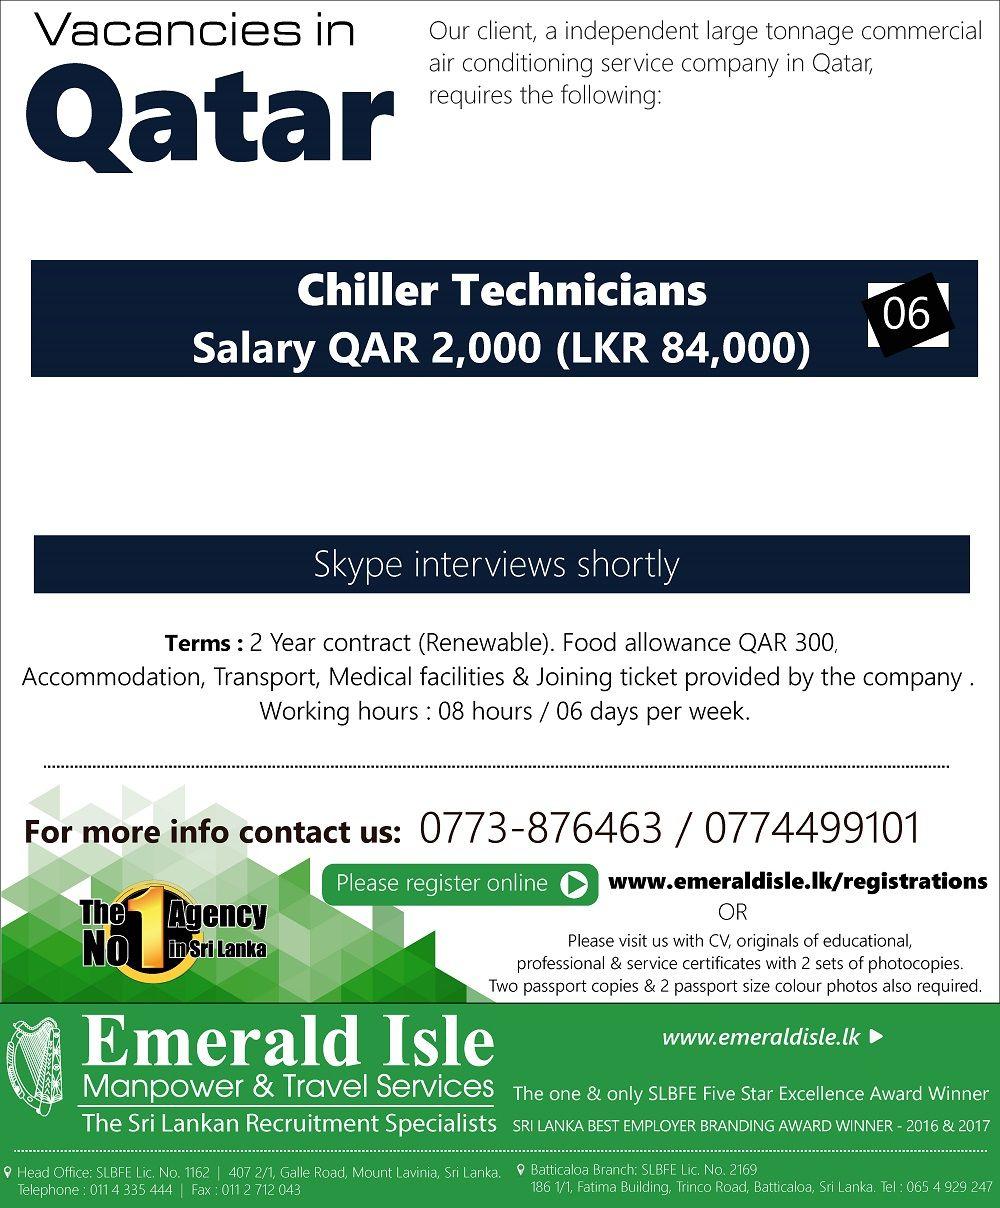 Emerald Isle Recruitment Specialist Air conditioning